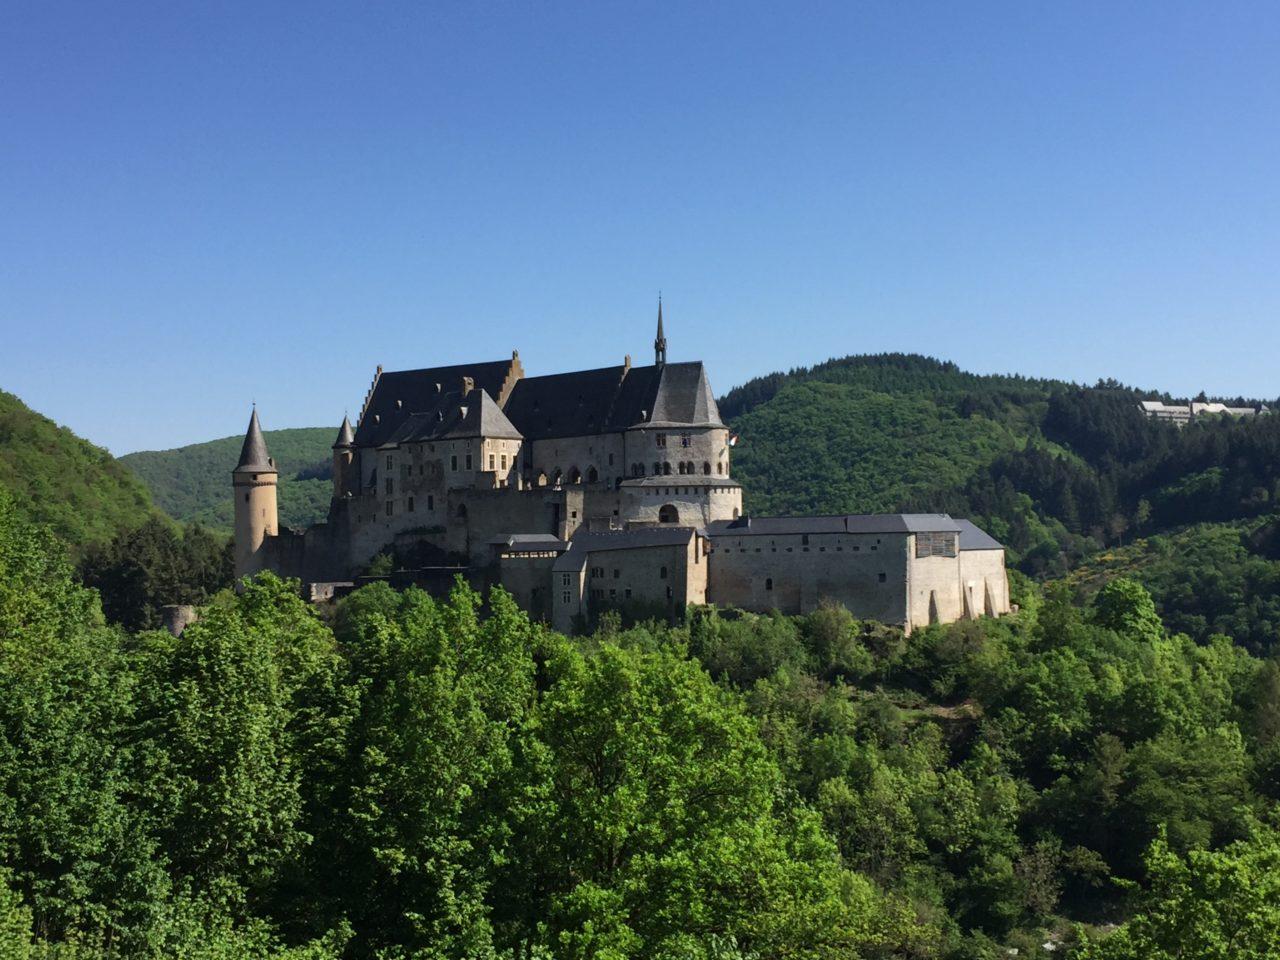 Castle of Vianden in Vianden, <em><strong>Luxembourg</strong></em>